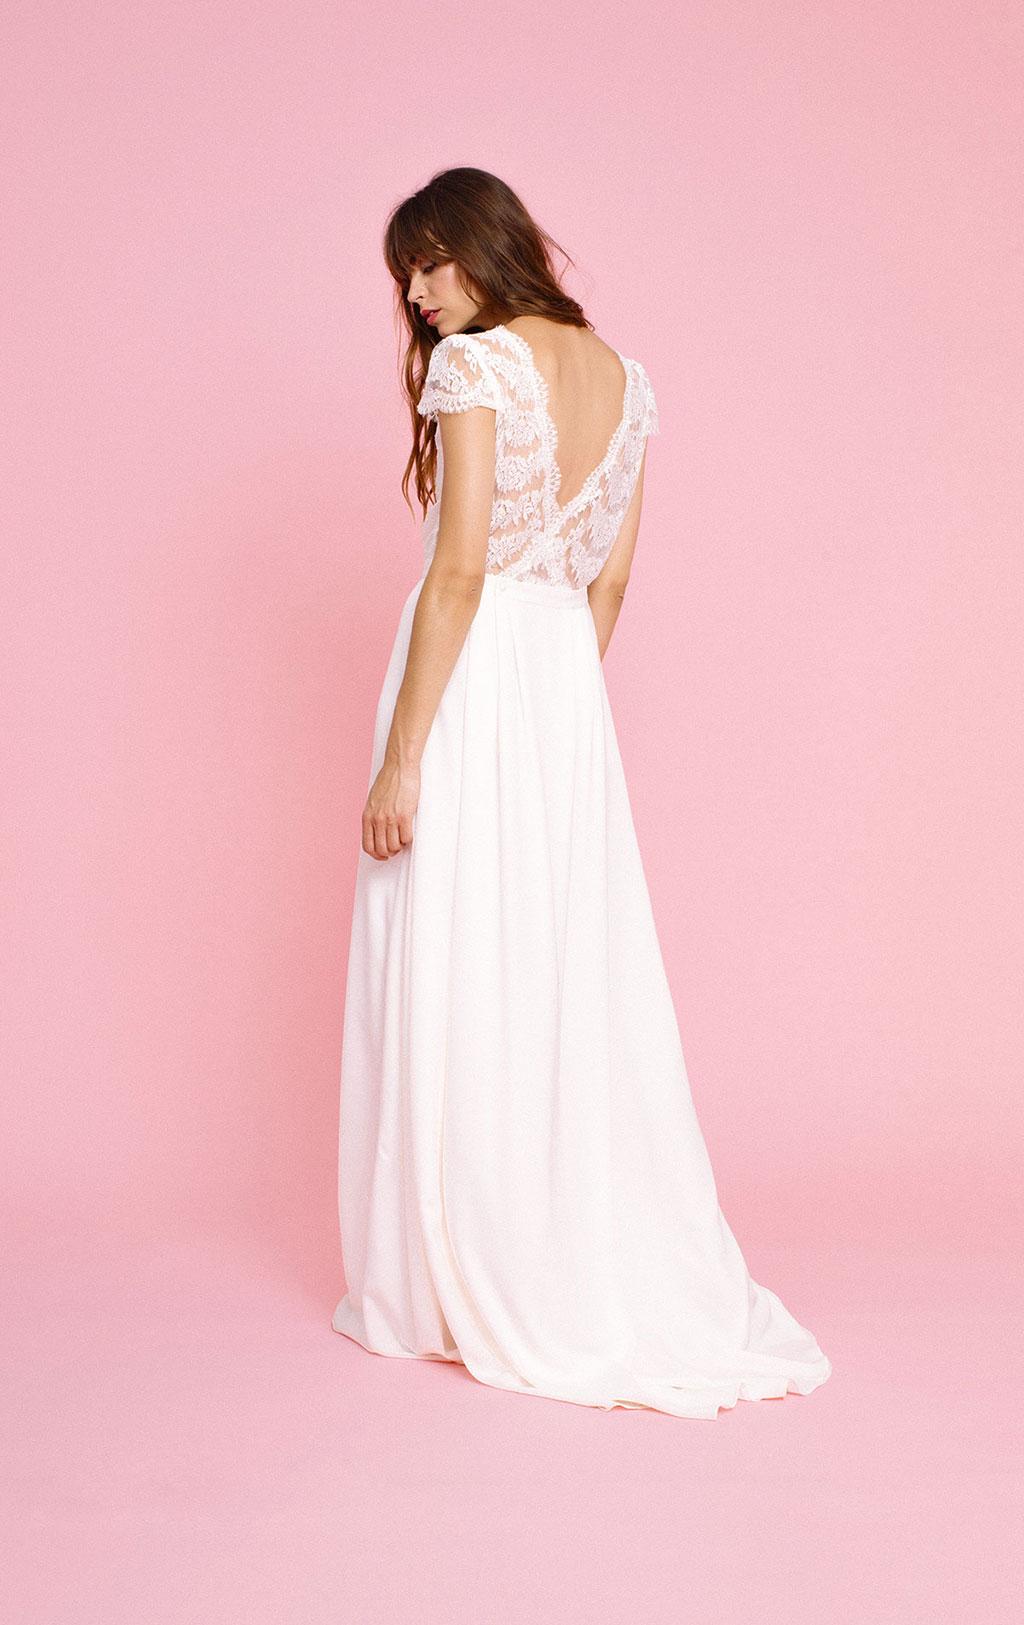 elise-hameau-robes-de-mariee-mariage-wedding-dresses-couture-bridal_collection-permanente_003.jpg